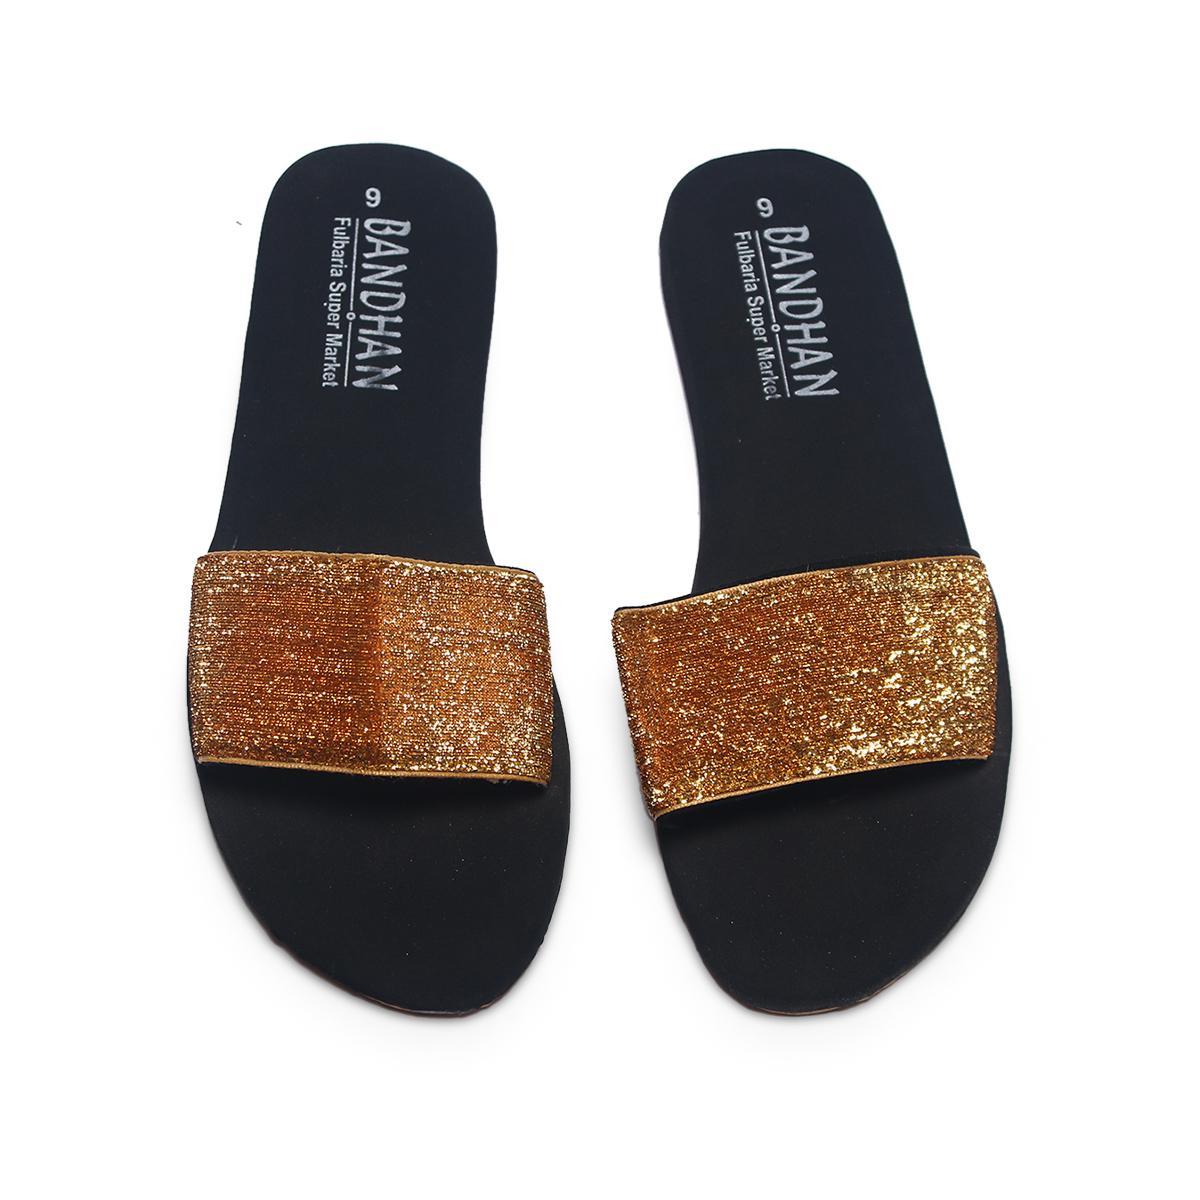 aa3238f454492 Women's Shoes Online: Buy Ladies Shoes In Bangladesh   Daraz.com.bd